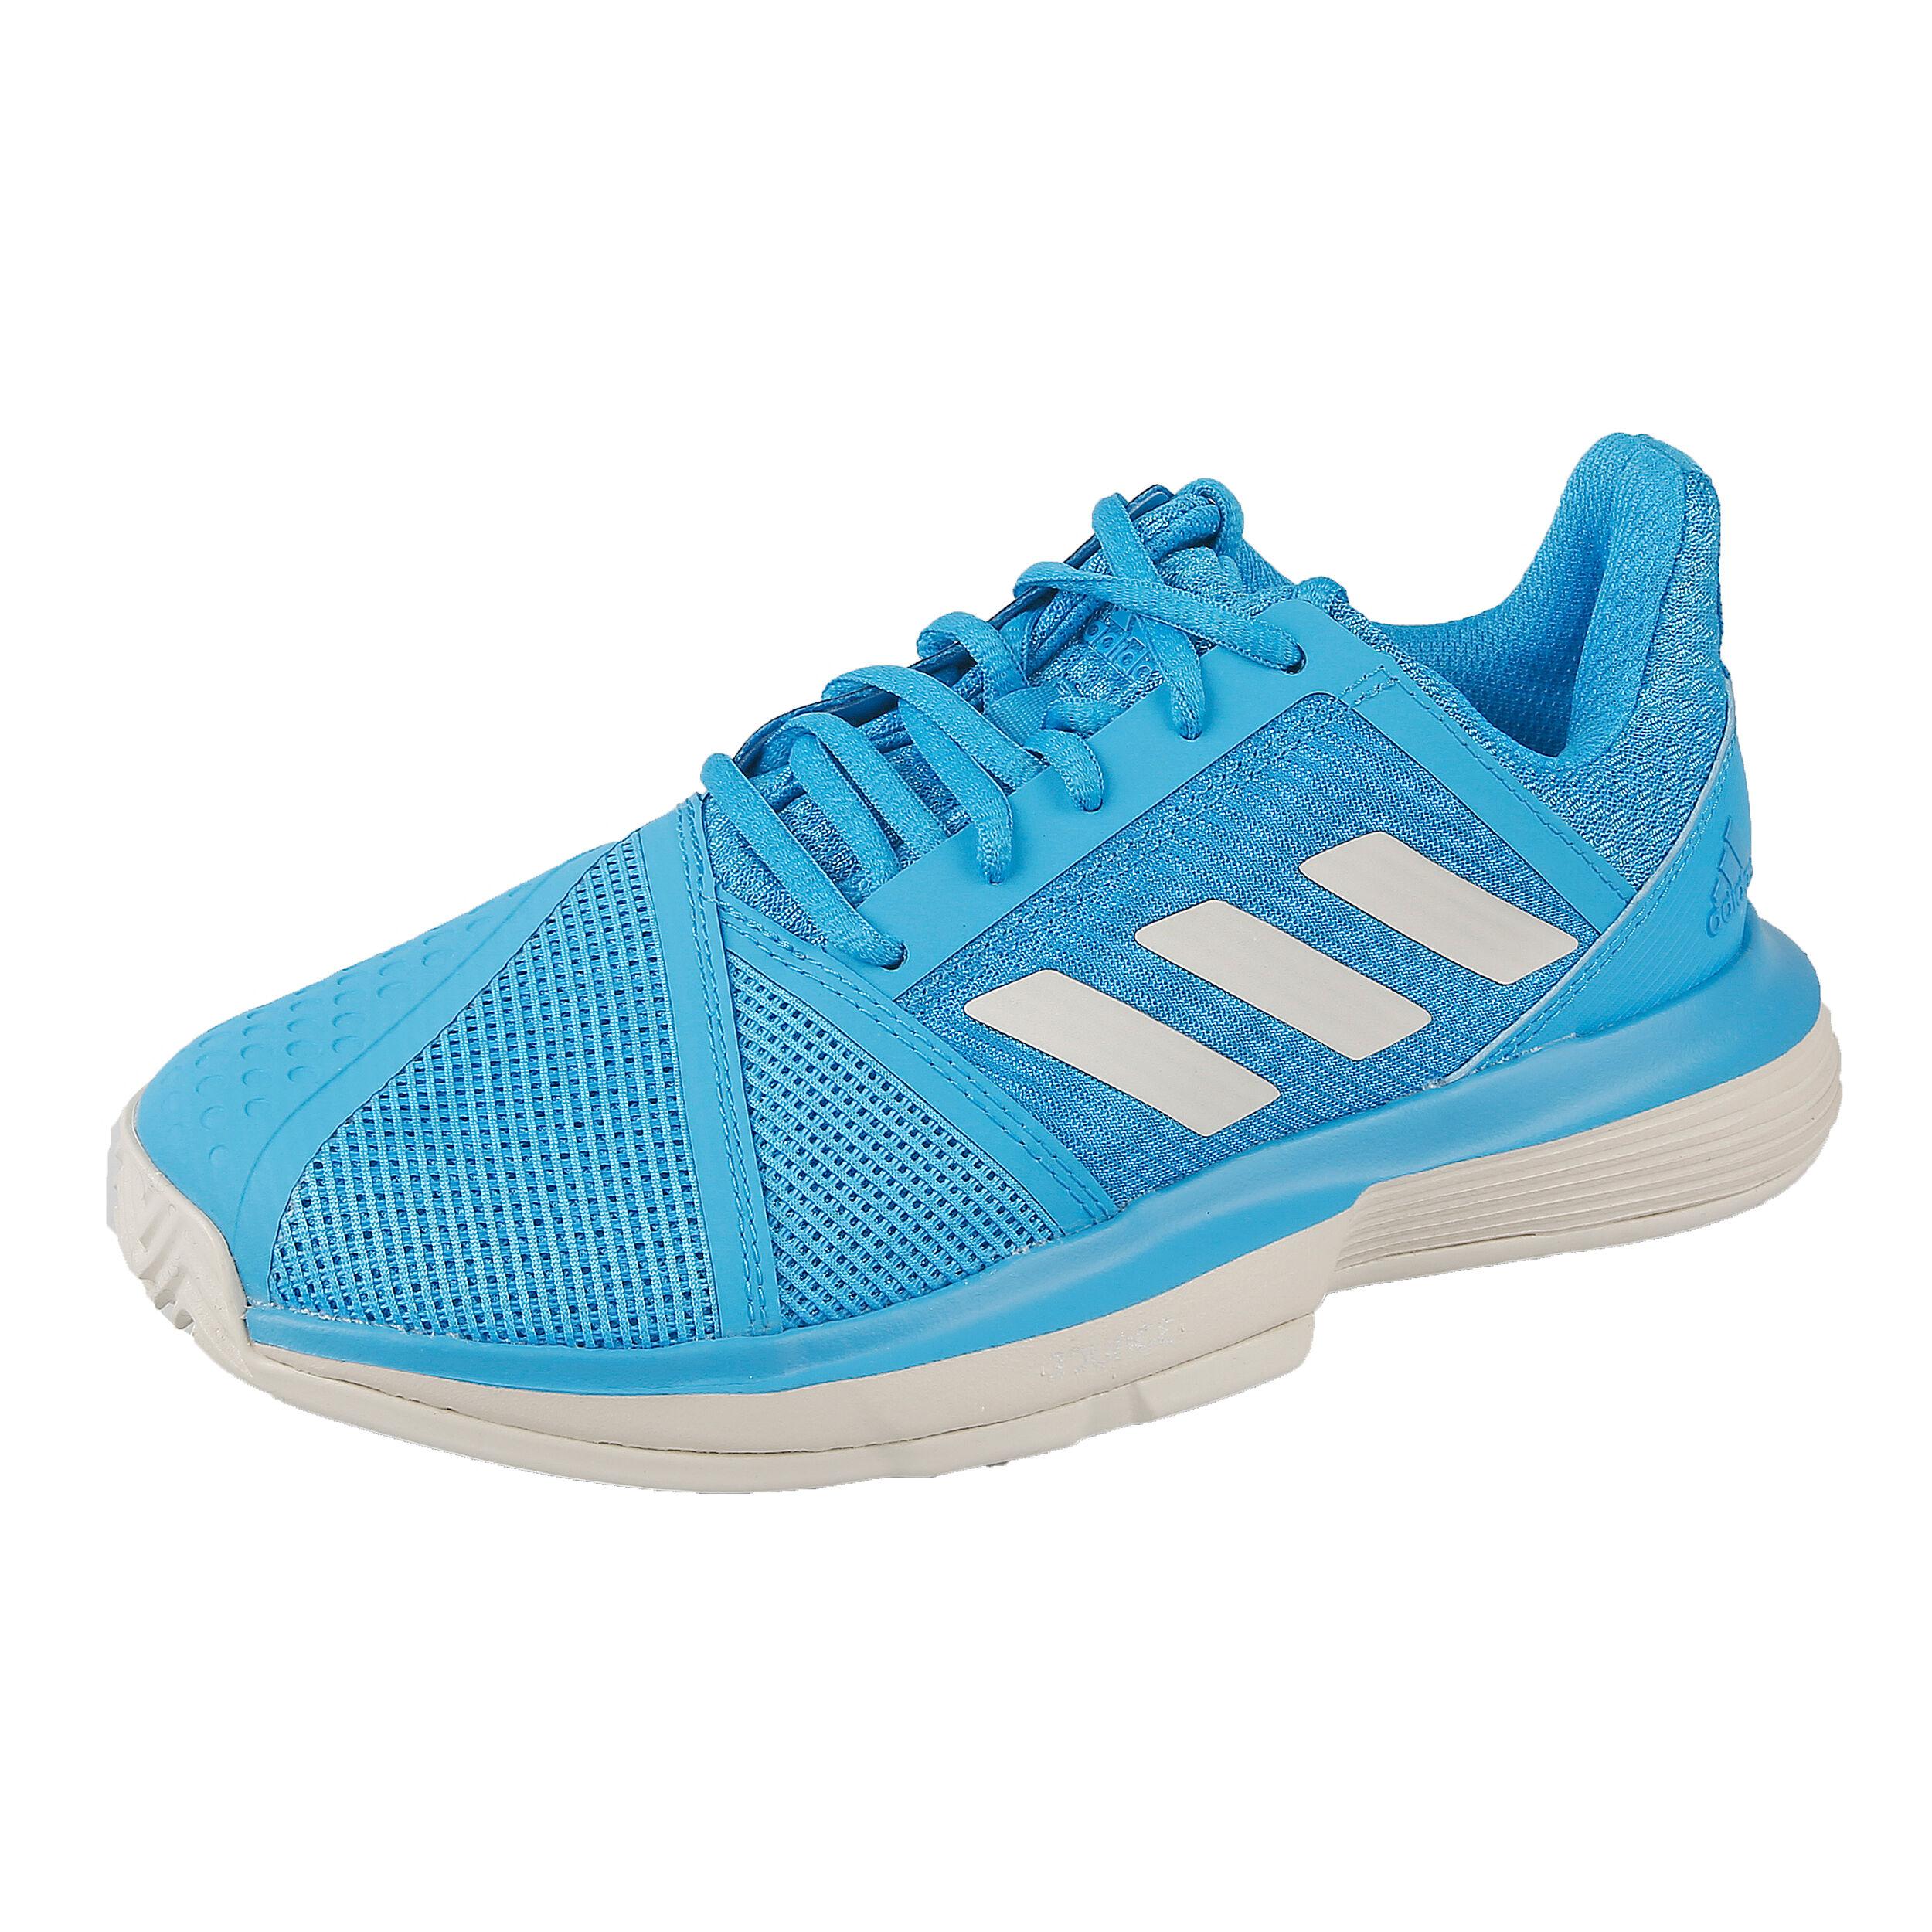 adidas Court Jam Bounce Clay Gravelschoen Dames - Lichtblauw, Wit